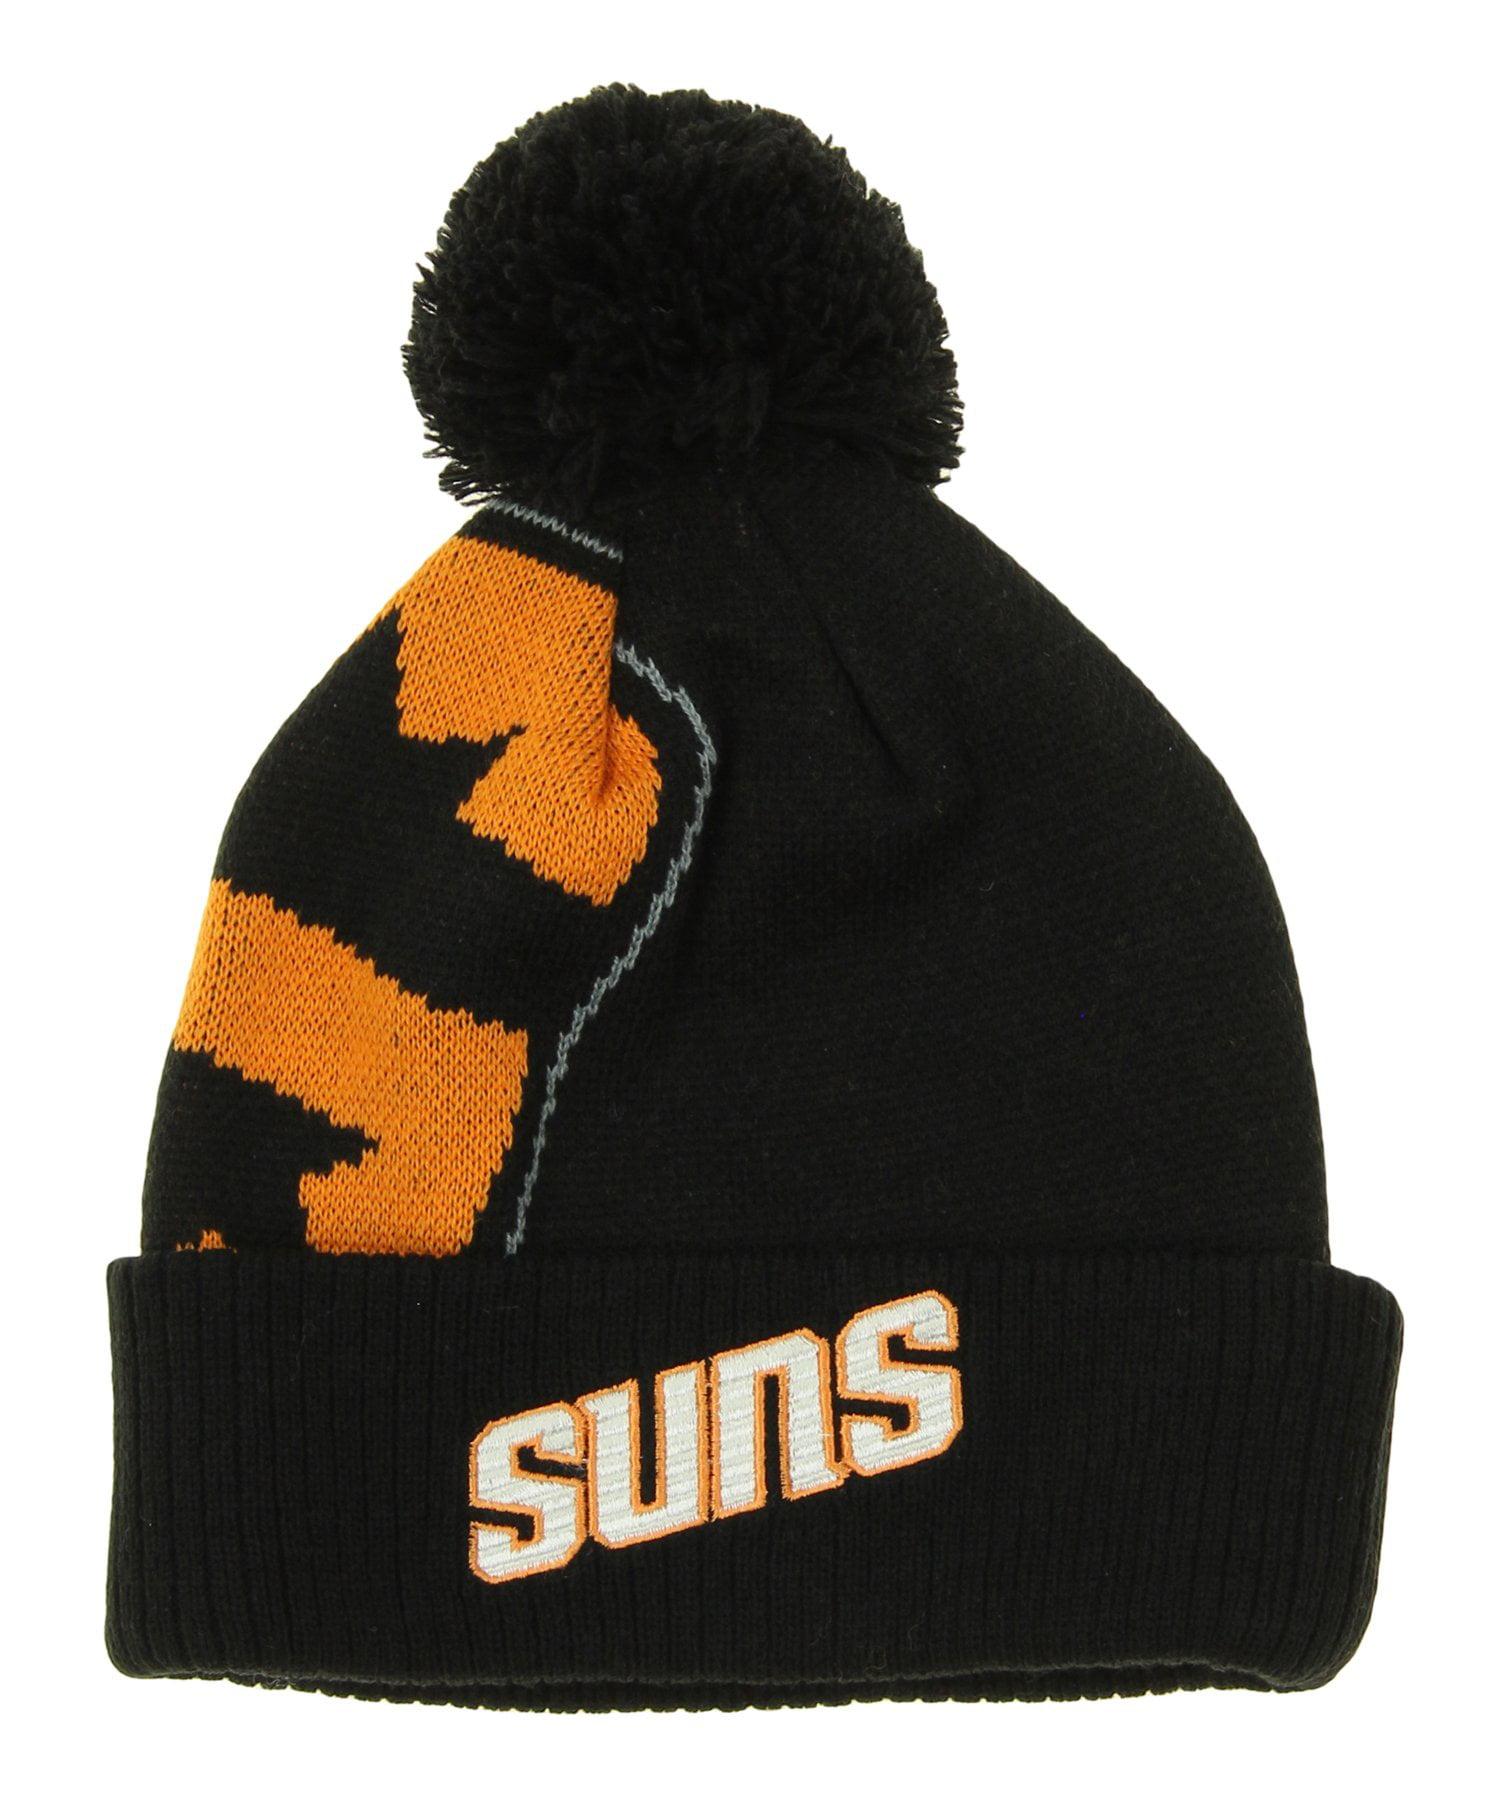 13b9dfa649588e ... coupon code for adidas nba youth phoenix suns cuffed knit hat with pom  black 5aa25 2f193